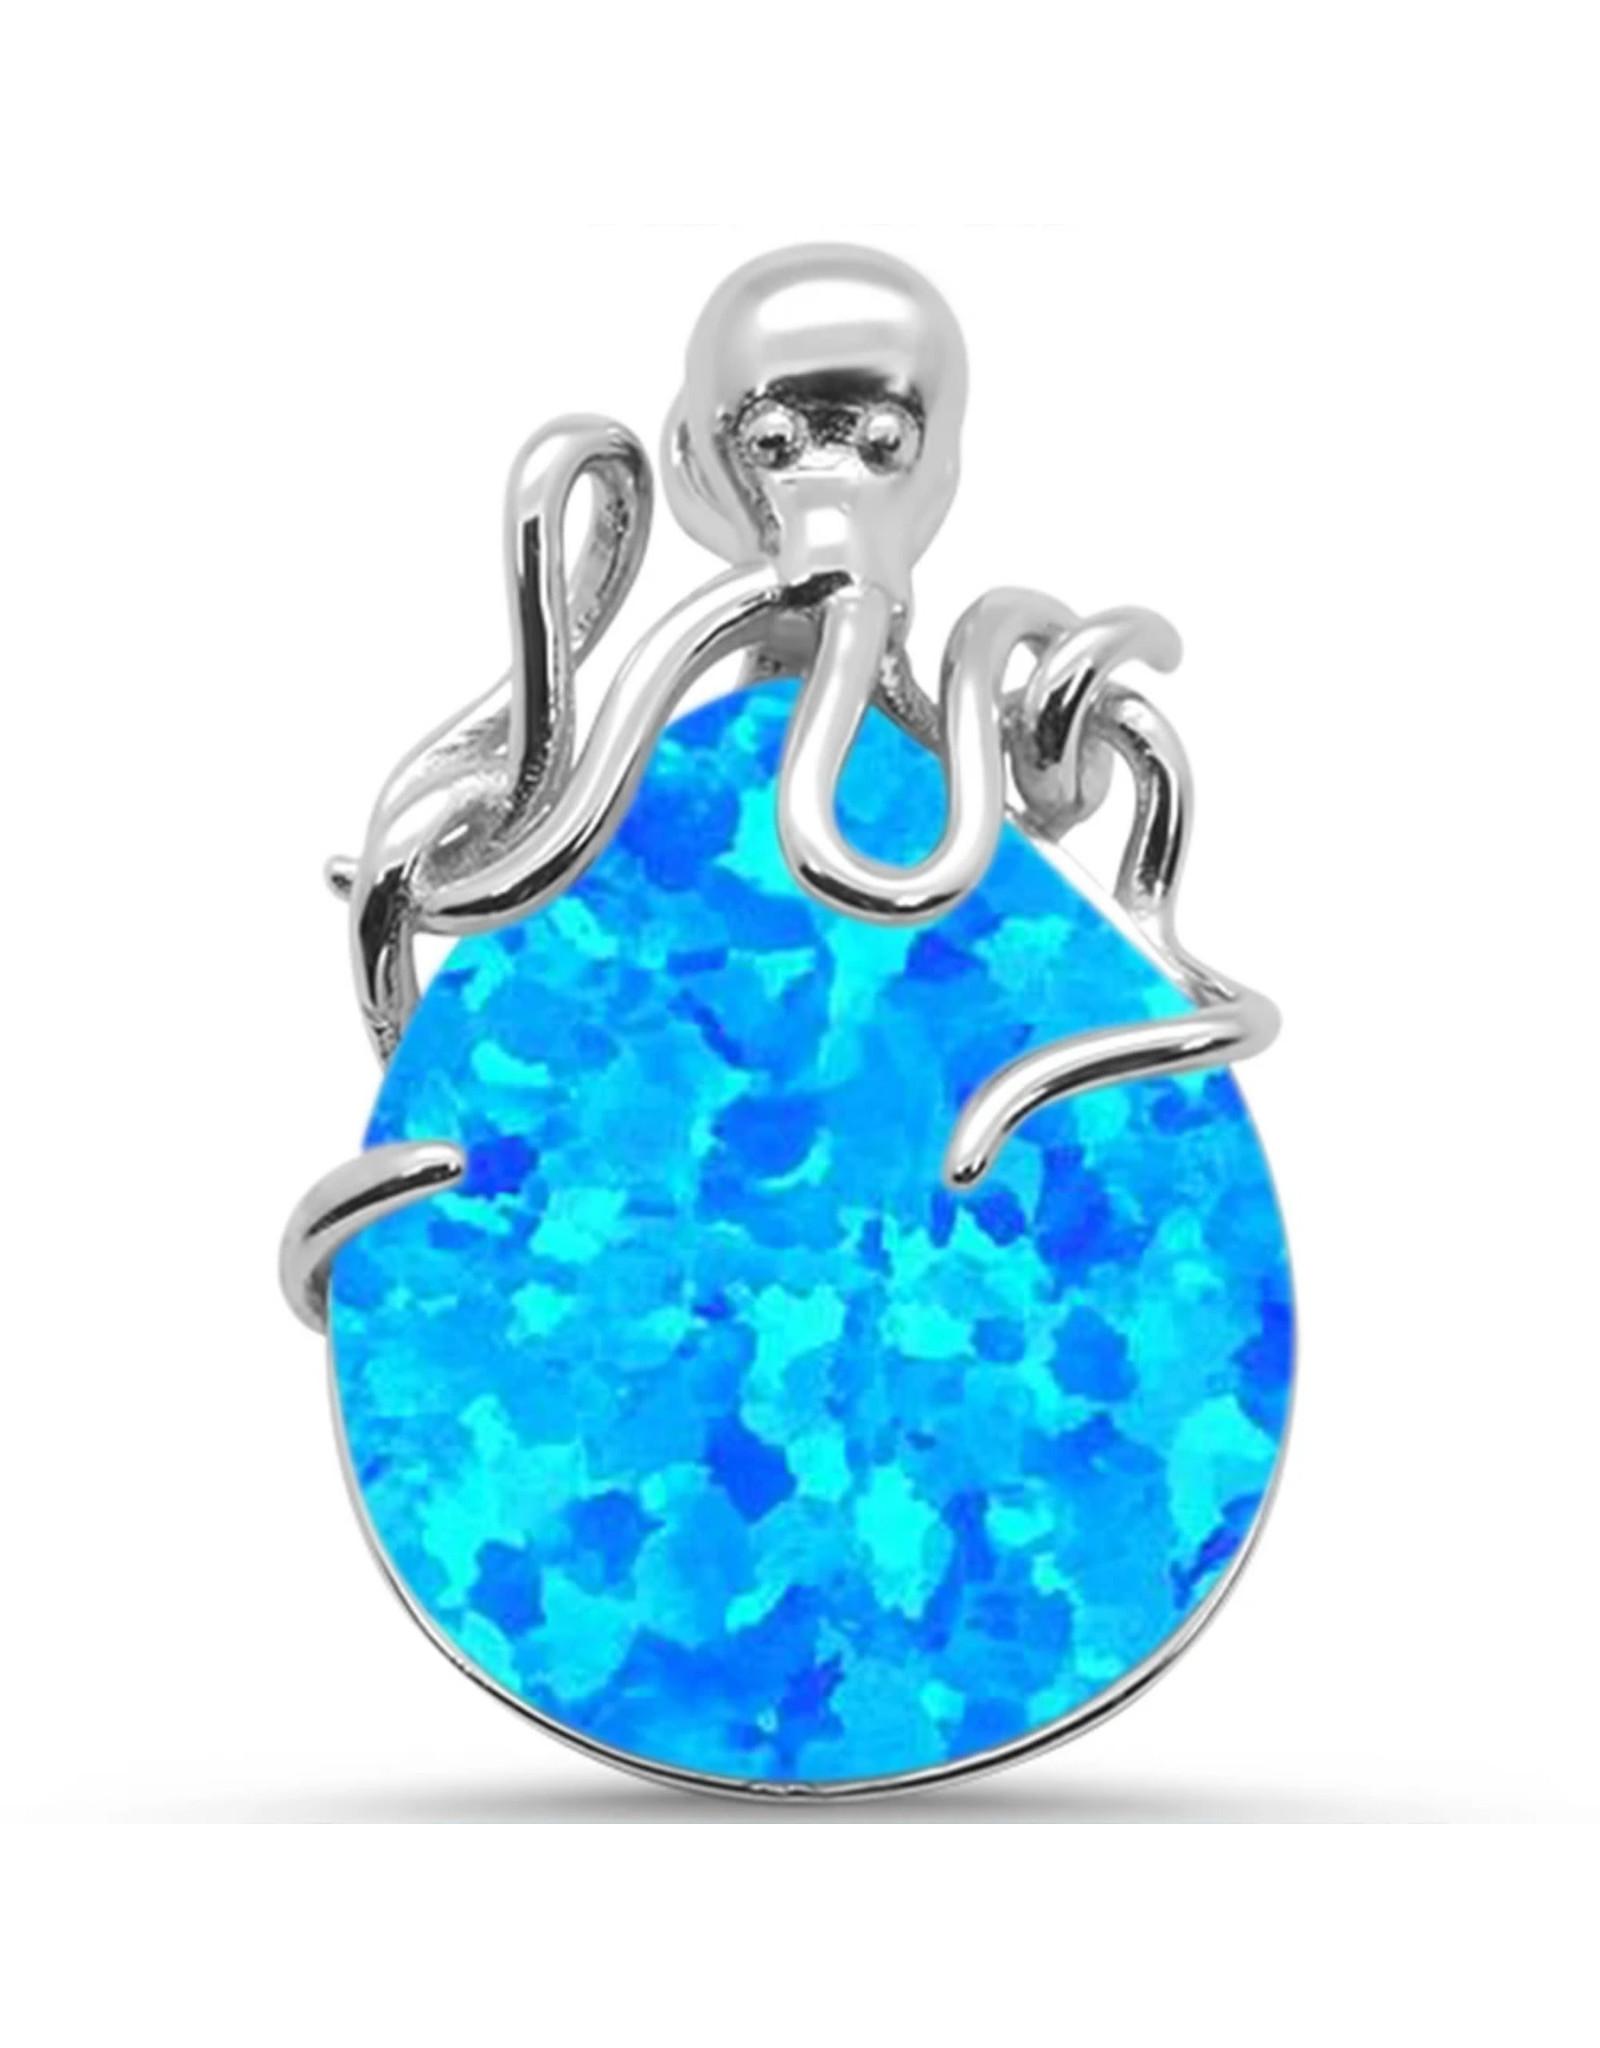 Sonara Jewelry Blue Opal Octopus Pendant